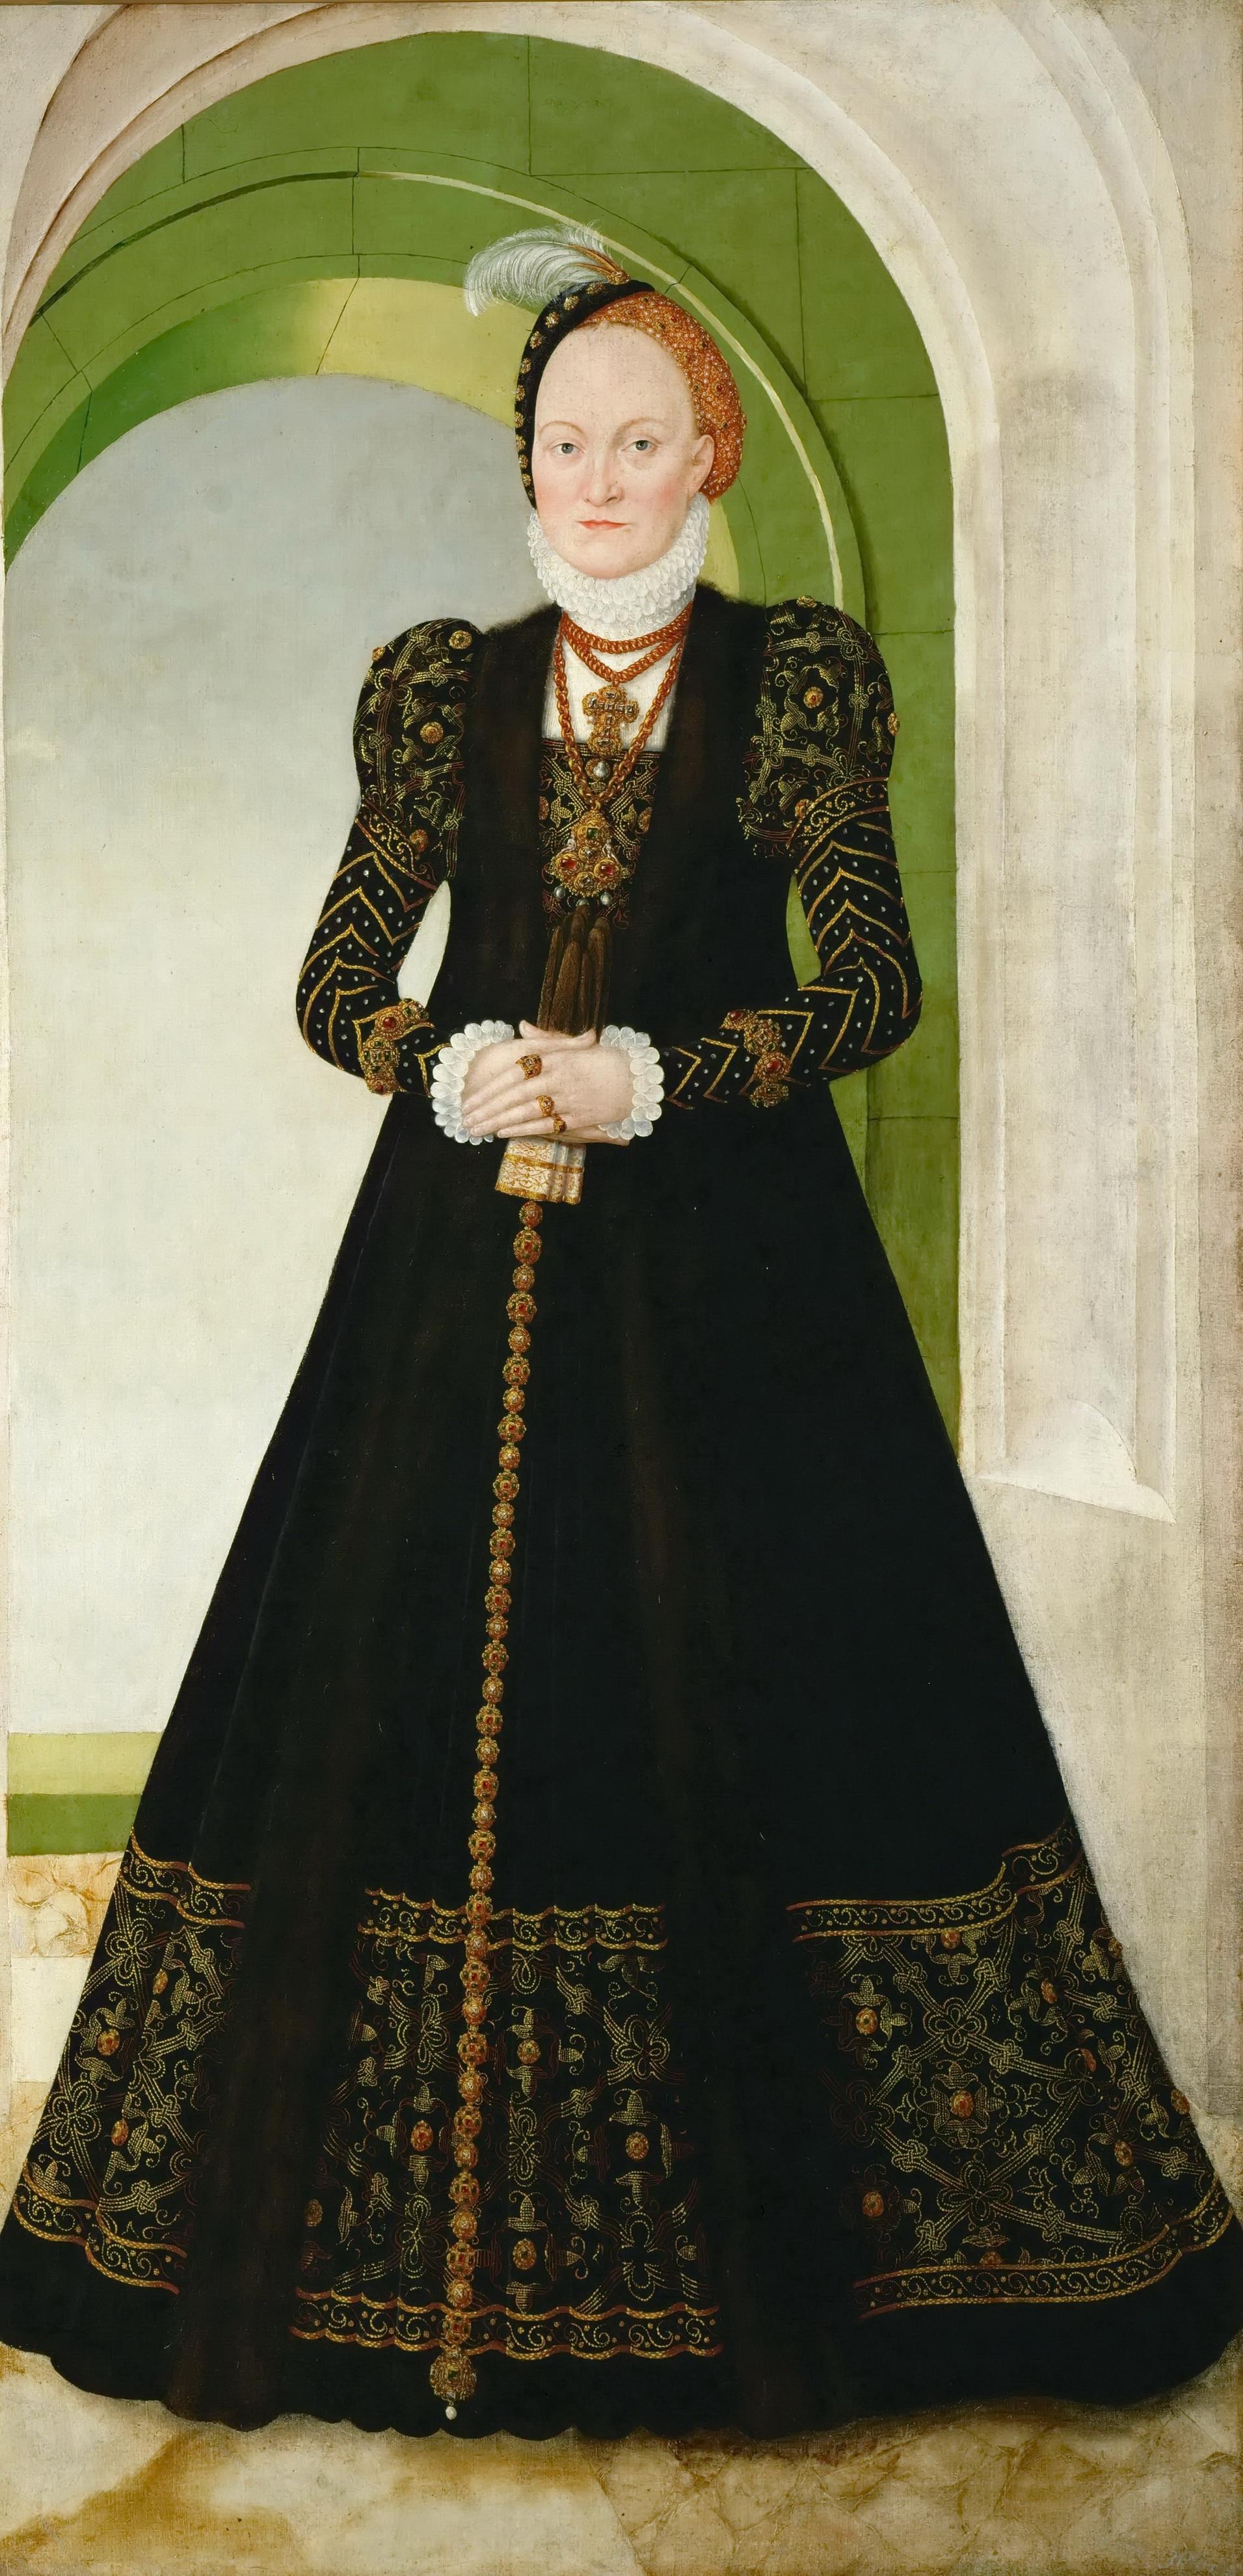 File:Lucas Cranach d. J. 011.jpg - Wikimedia Commons